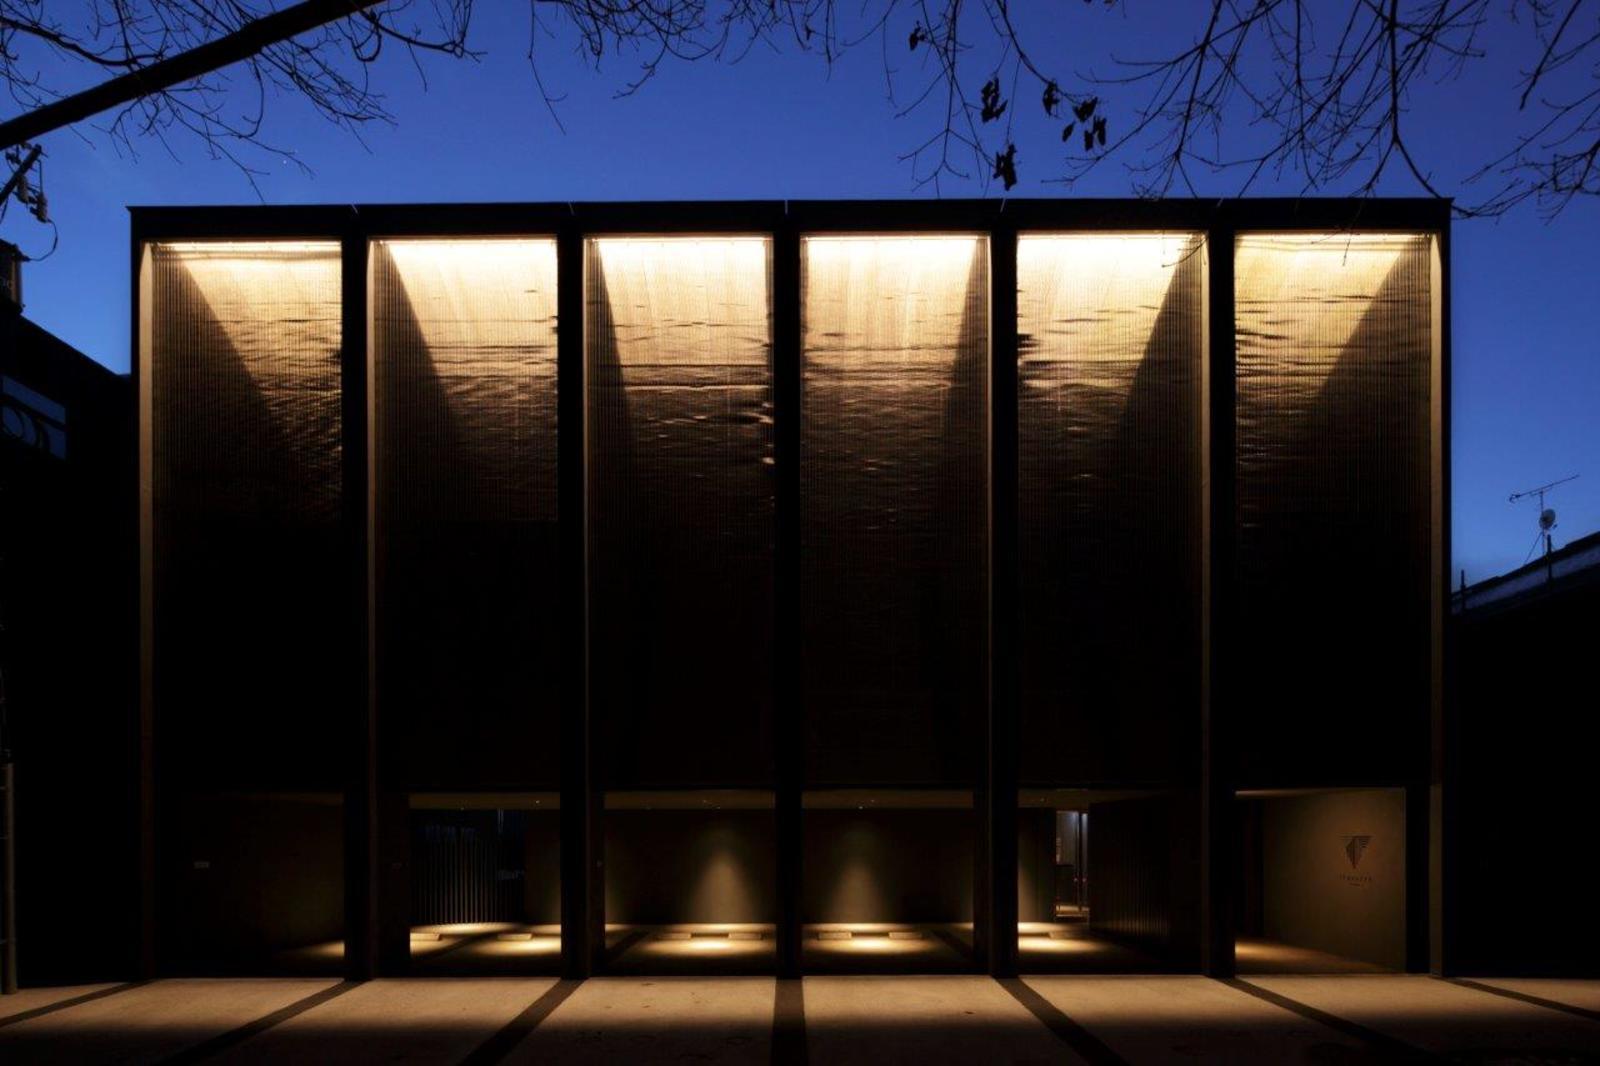 Terrazze night exterior 2 large